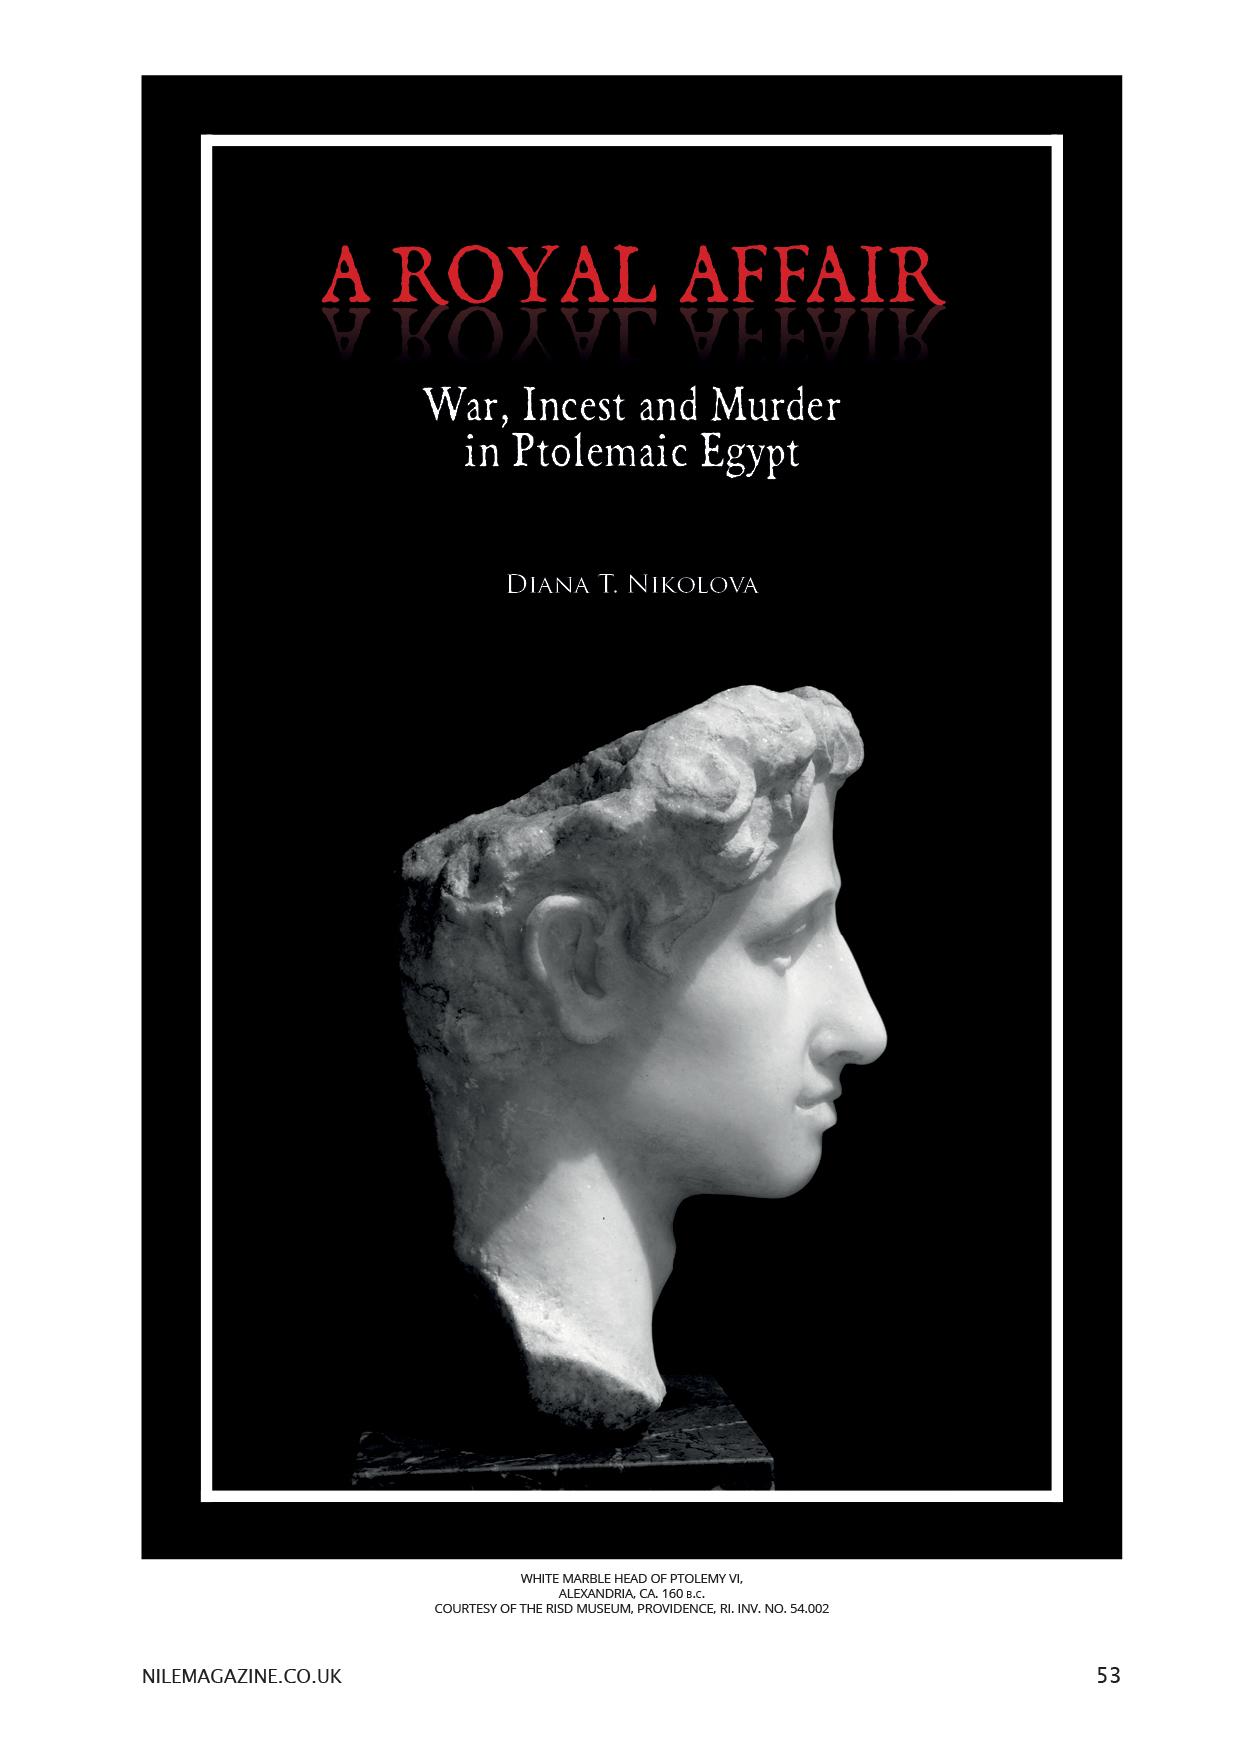 Nile 20, A Royal Affair 1 1A.jpg